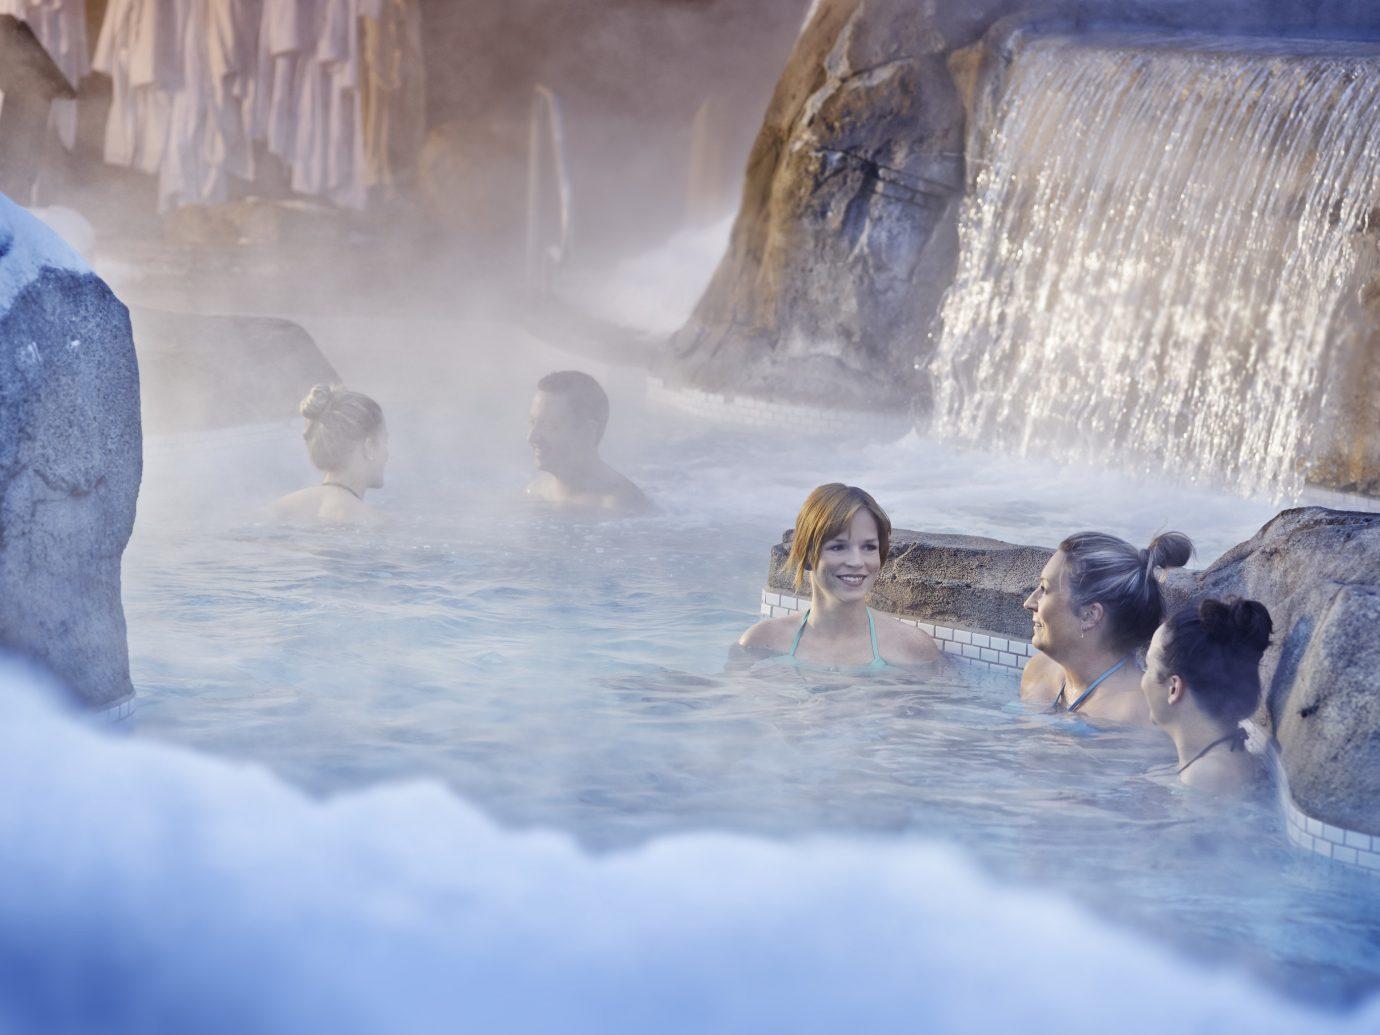 Health + Wellness Spa Retreats Trip Ideas water outdoor Winter ice season water feature Waterfall Sea